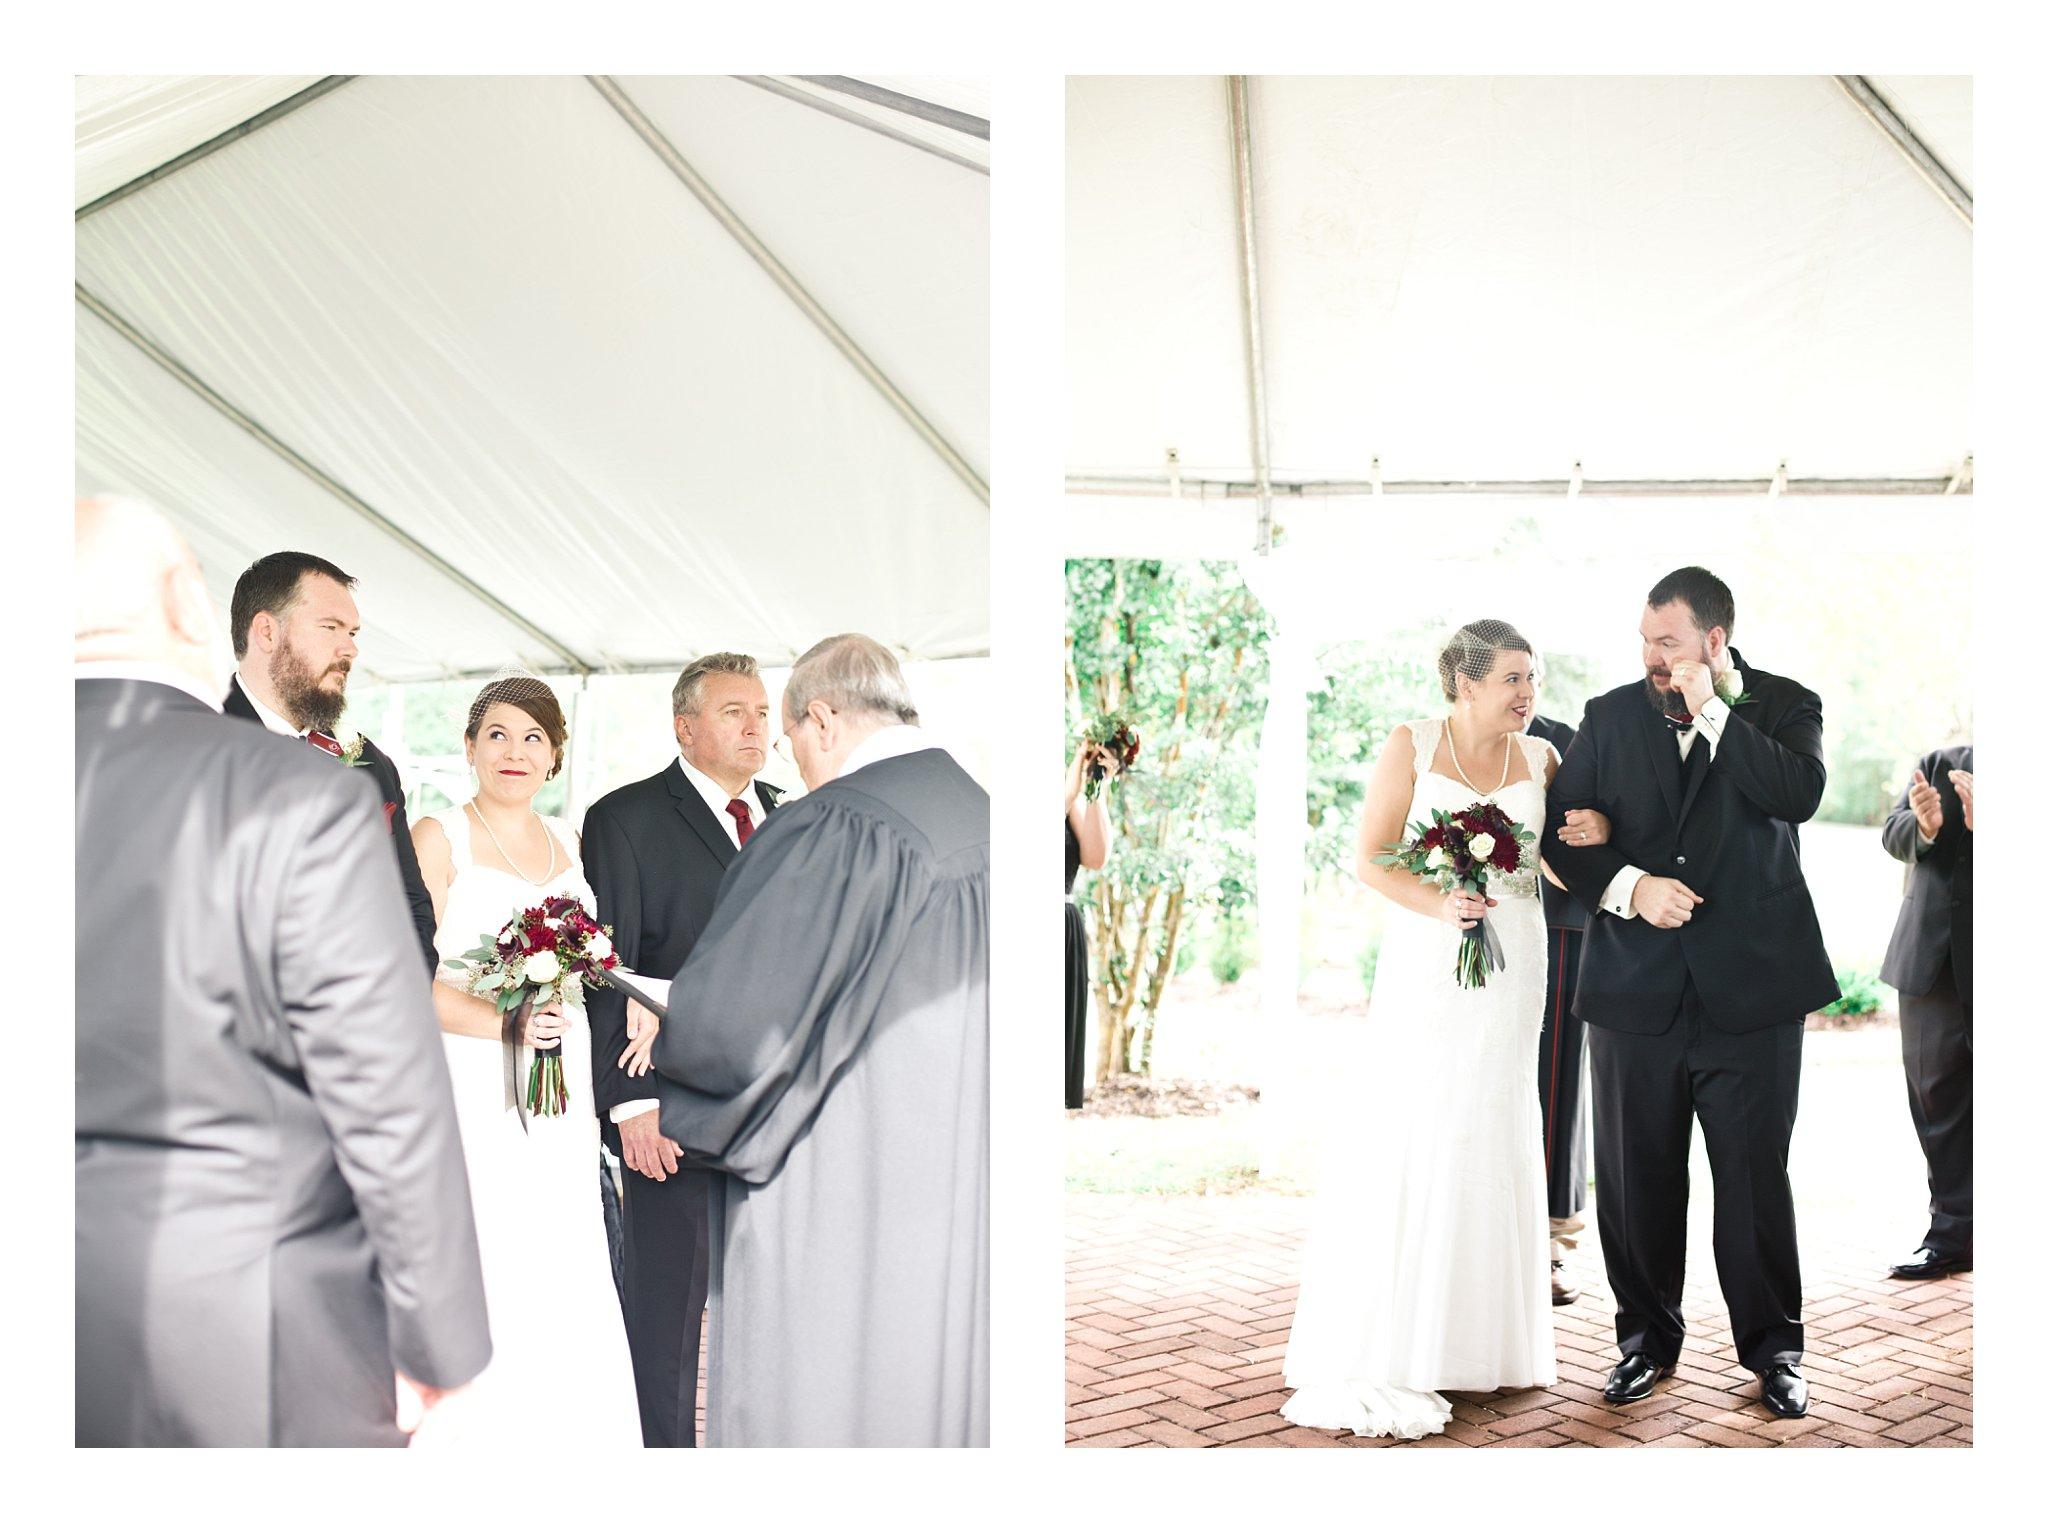 cypress-inn-garnet-black-lowcountry-vintage-wedding-conway-sc-photos_0150.jpg